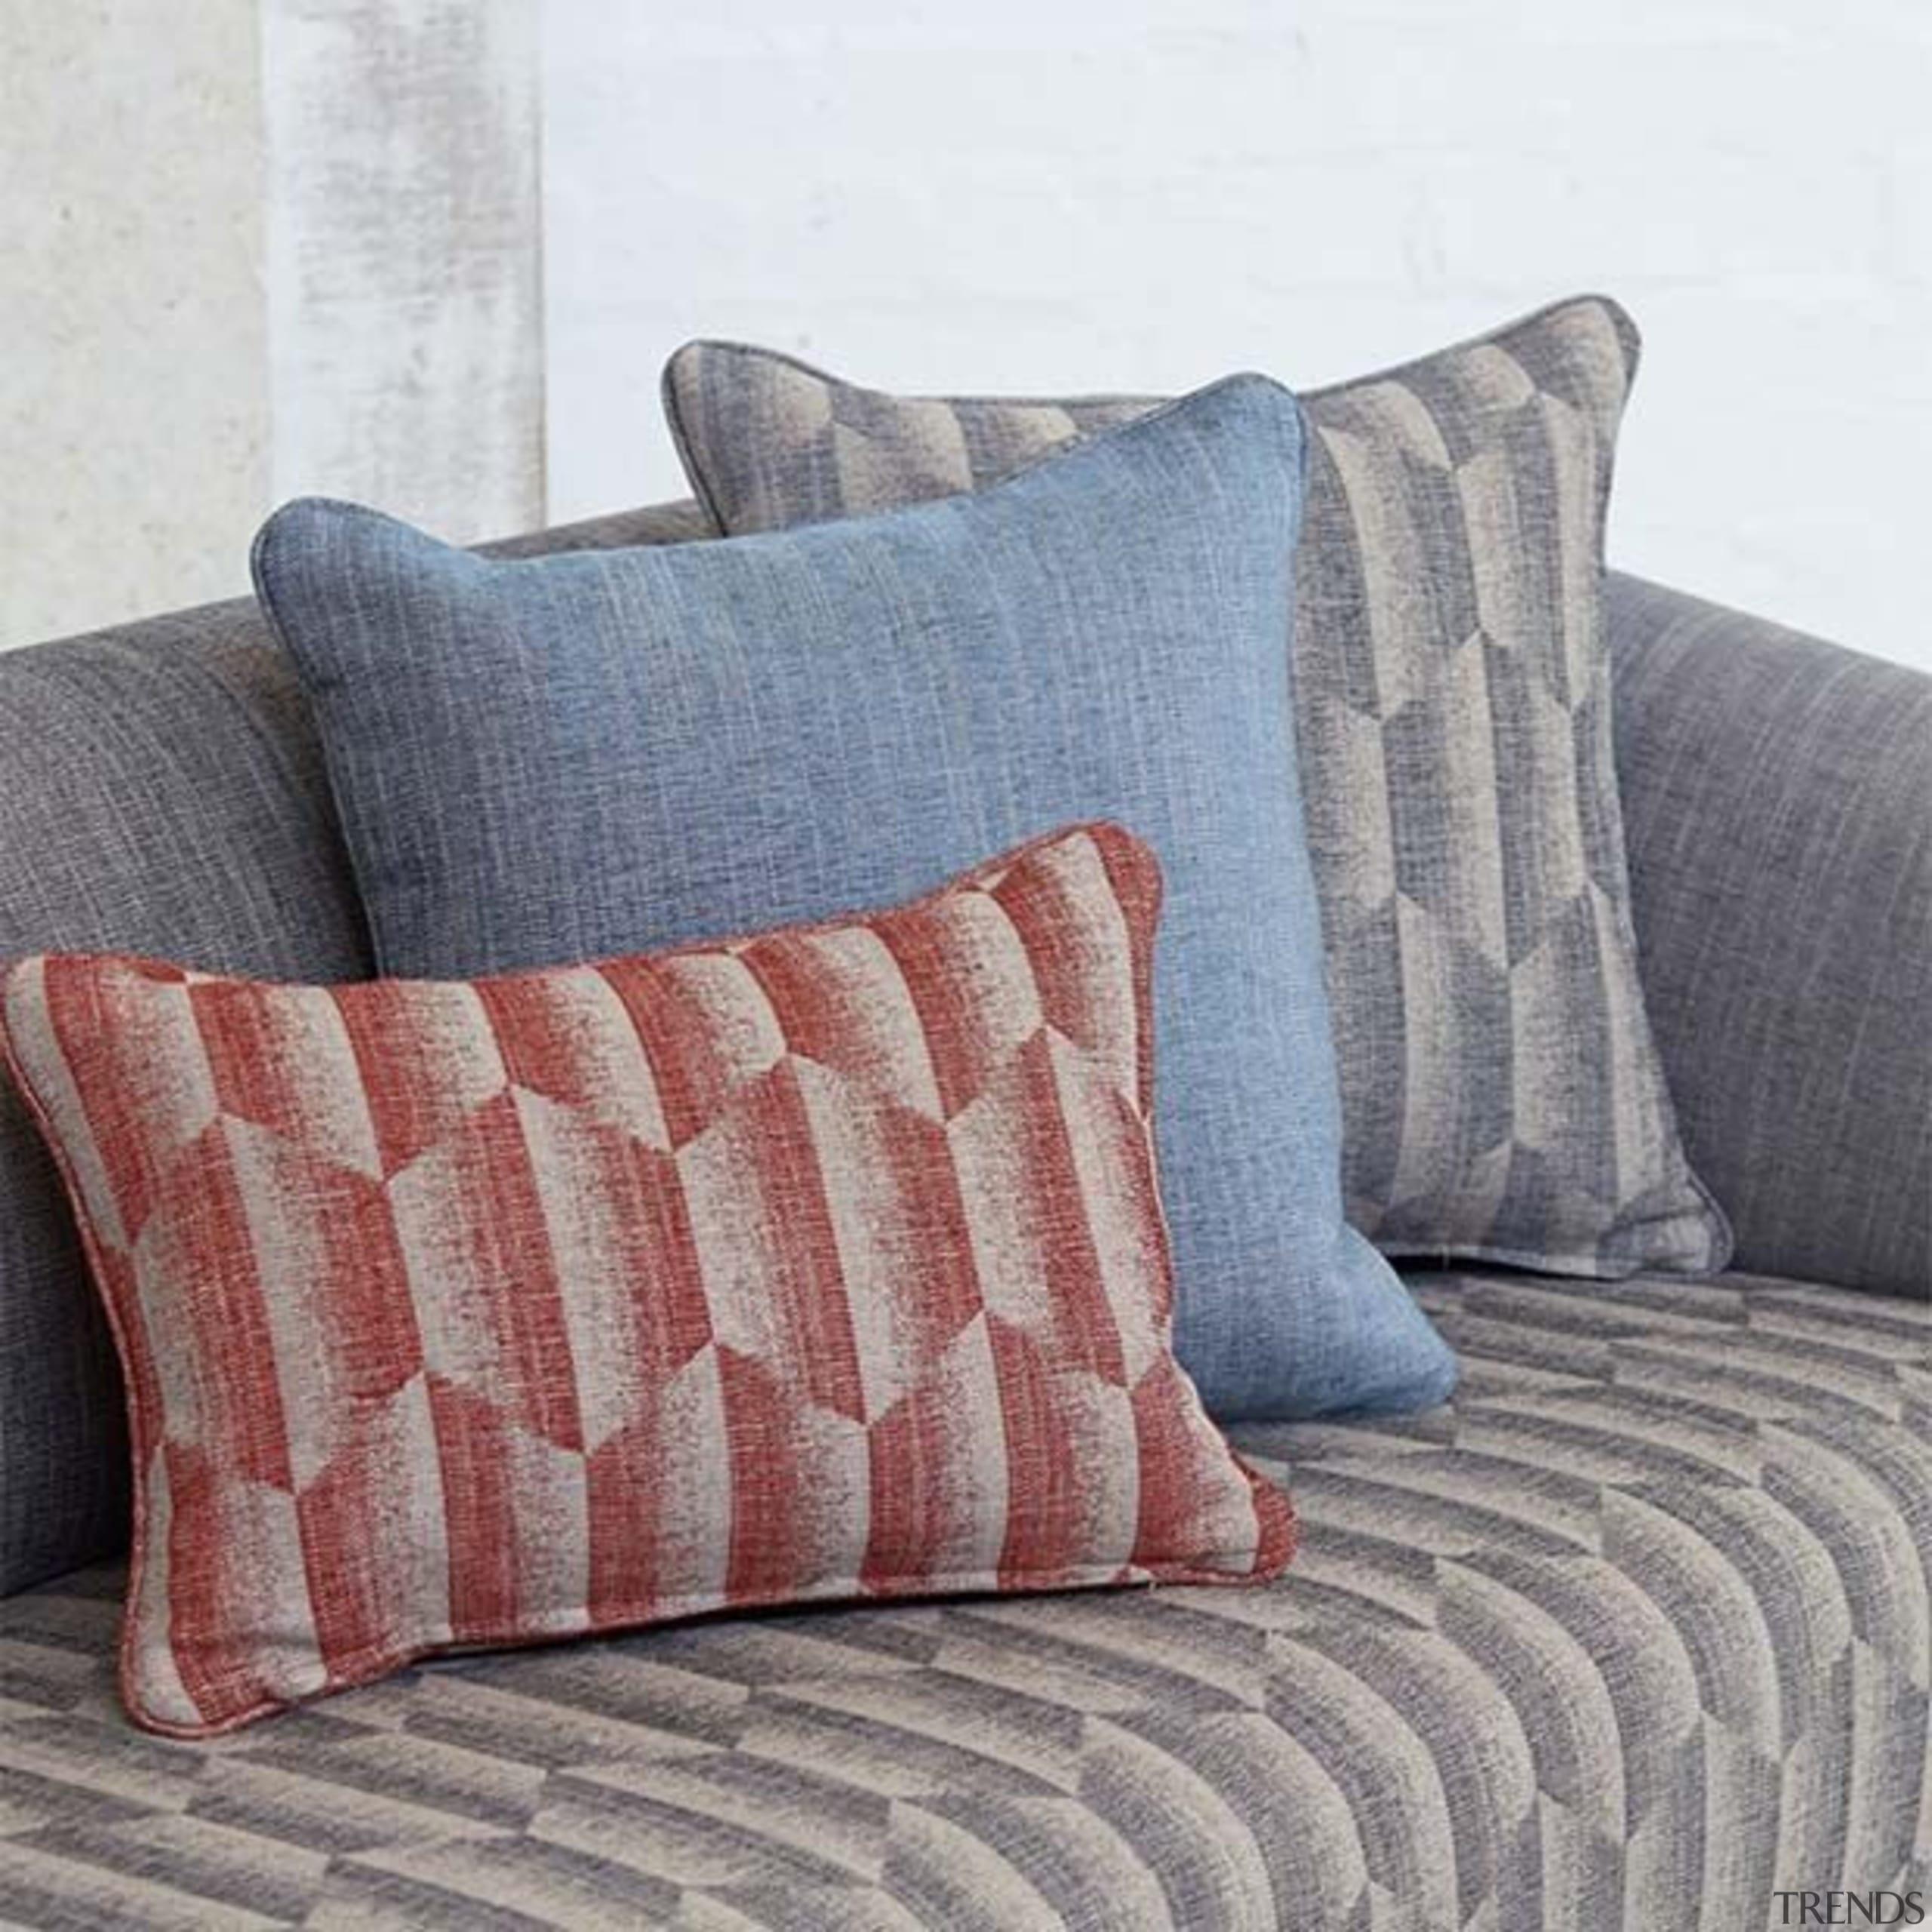 Dissolve 4 - couch   cushion   furniture couch, cushion, furniture, linens, pillow, textile, throw pillow, gray